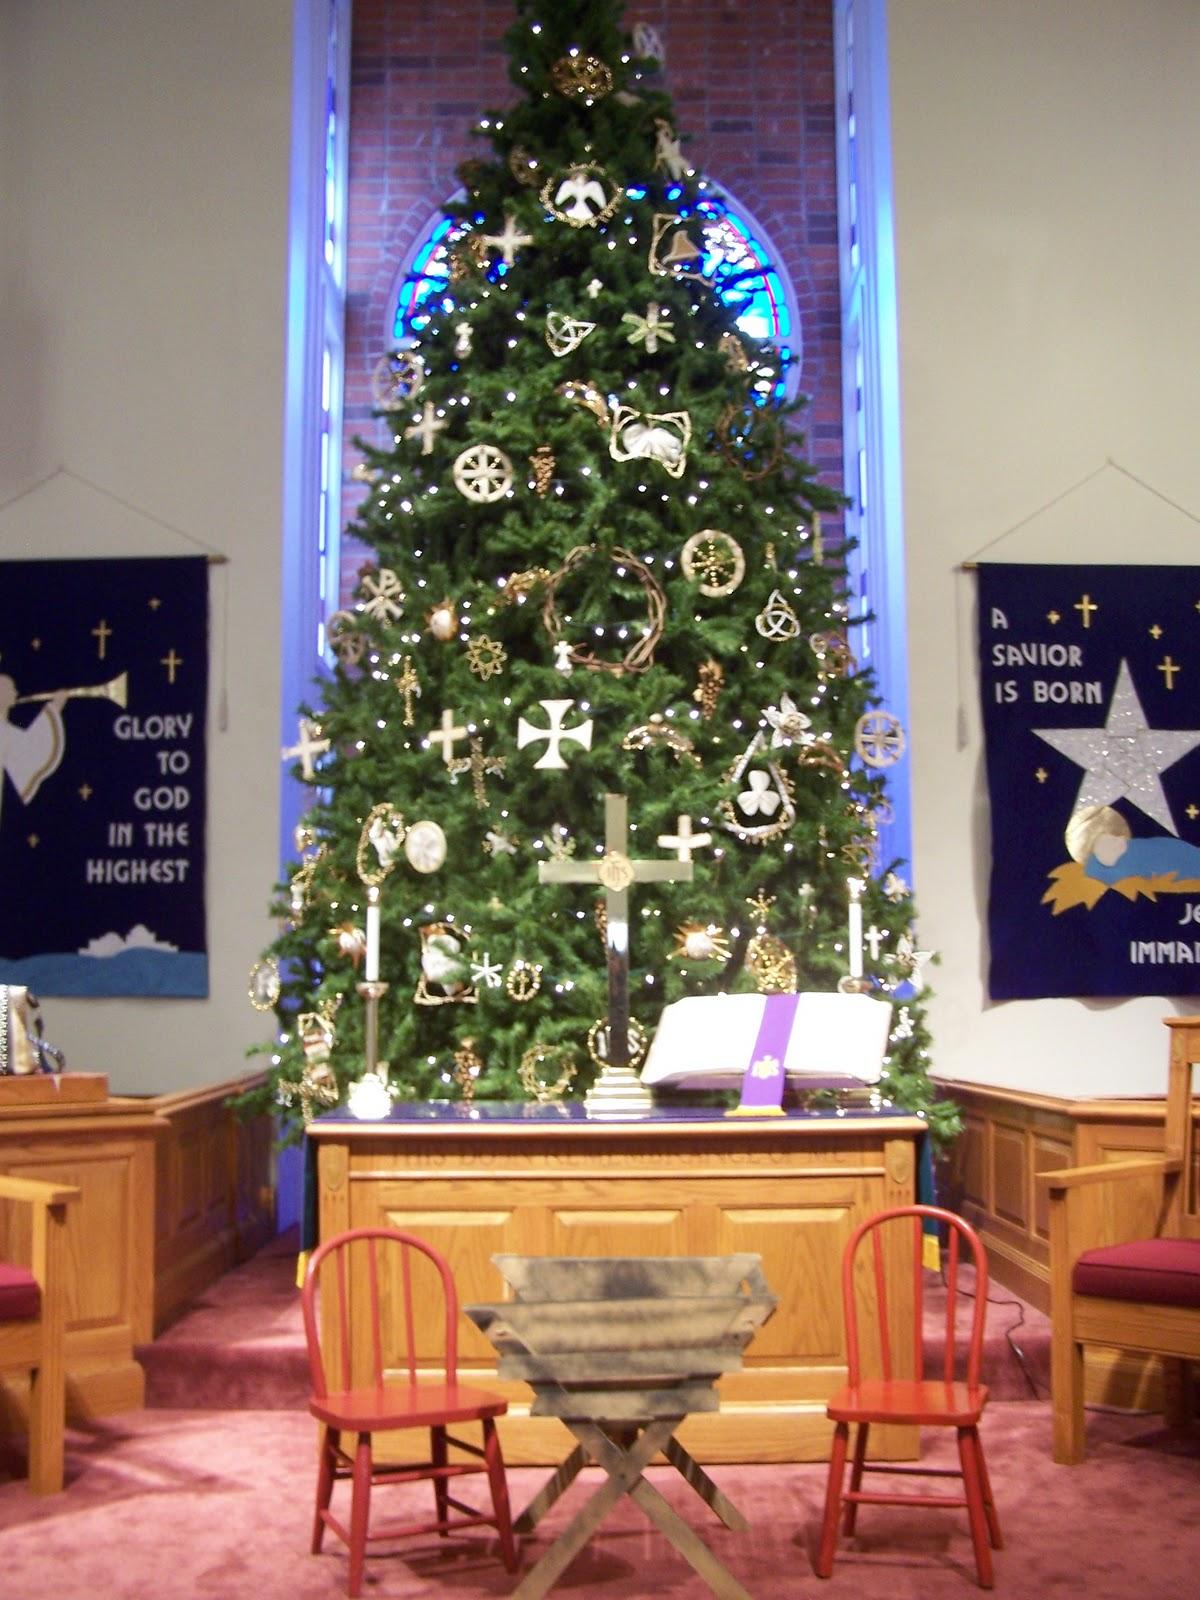 35 Church Christmas Decorations Ideas You Love Decoration Love